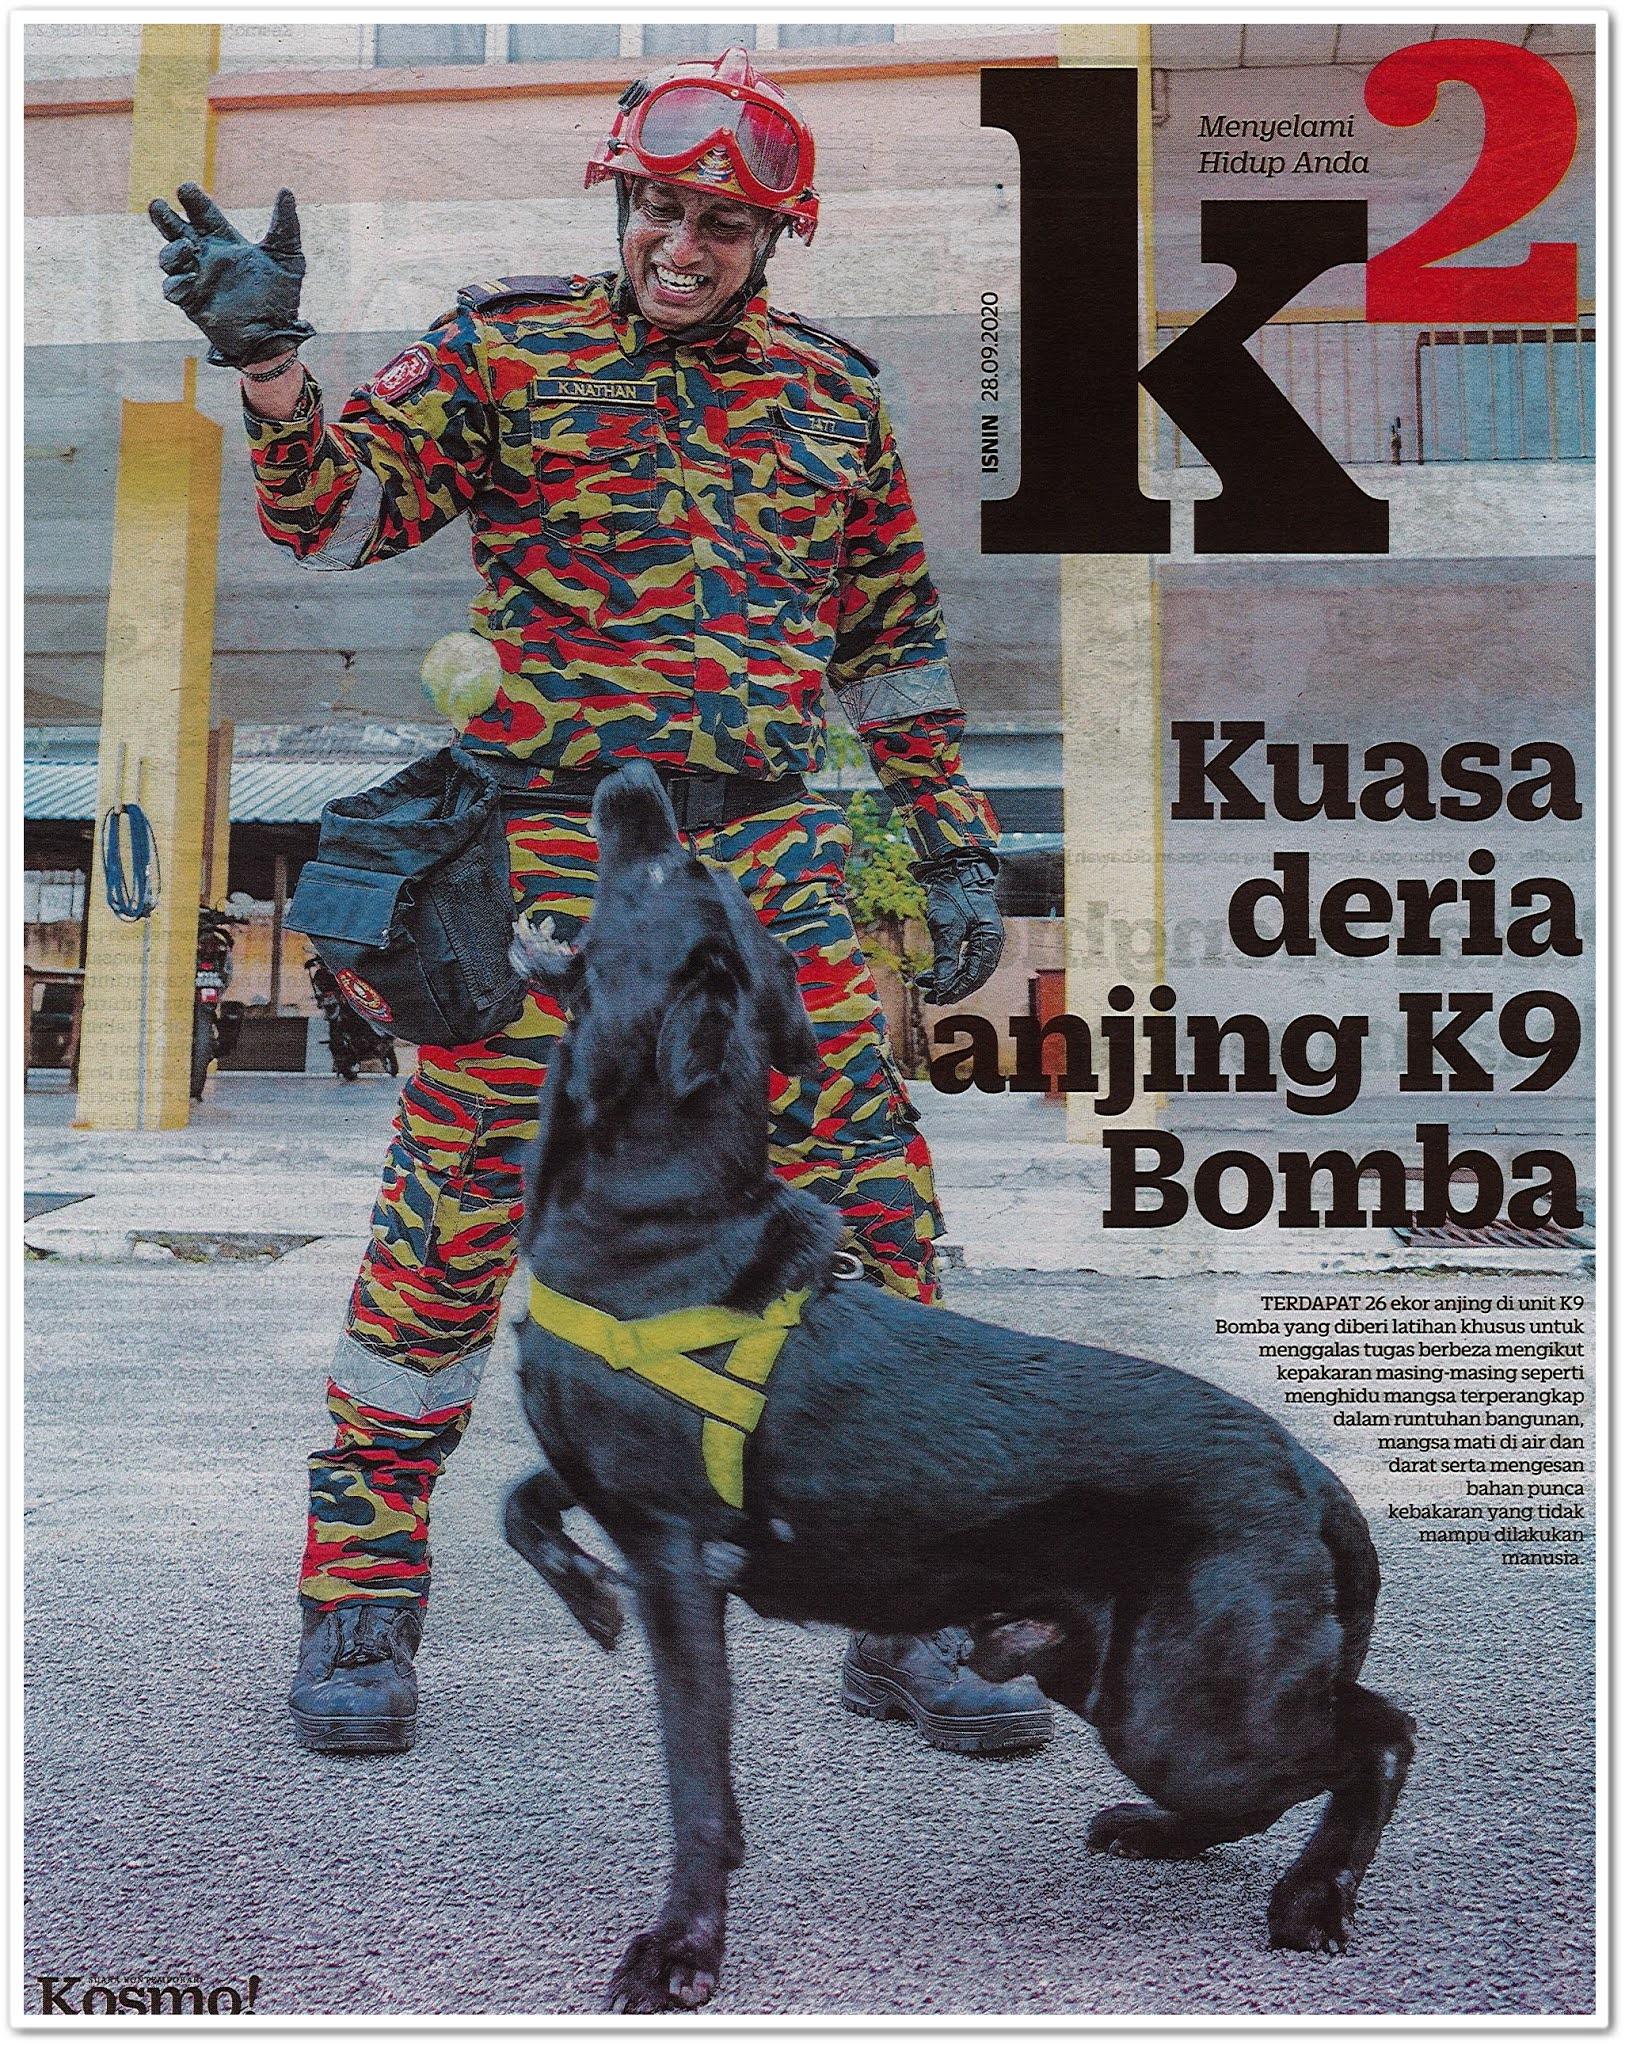 Kuasa deria anjing K9 Bomba - Keratan akhbar Kosmo! 28 September 2020